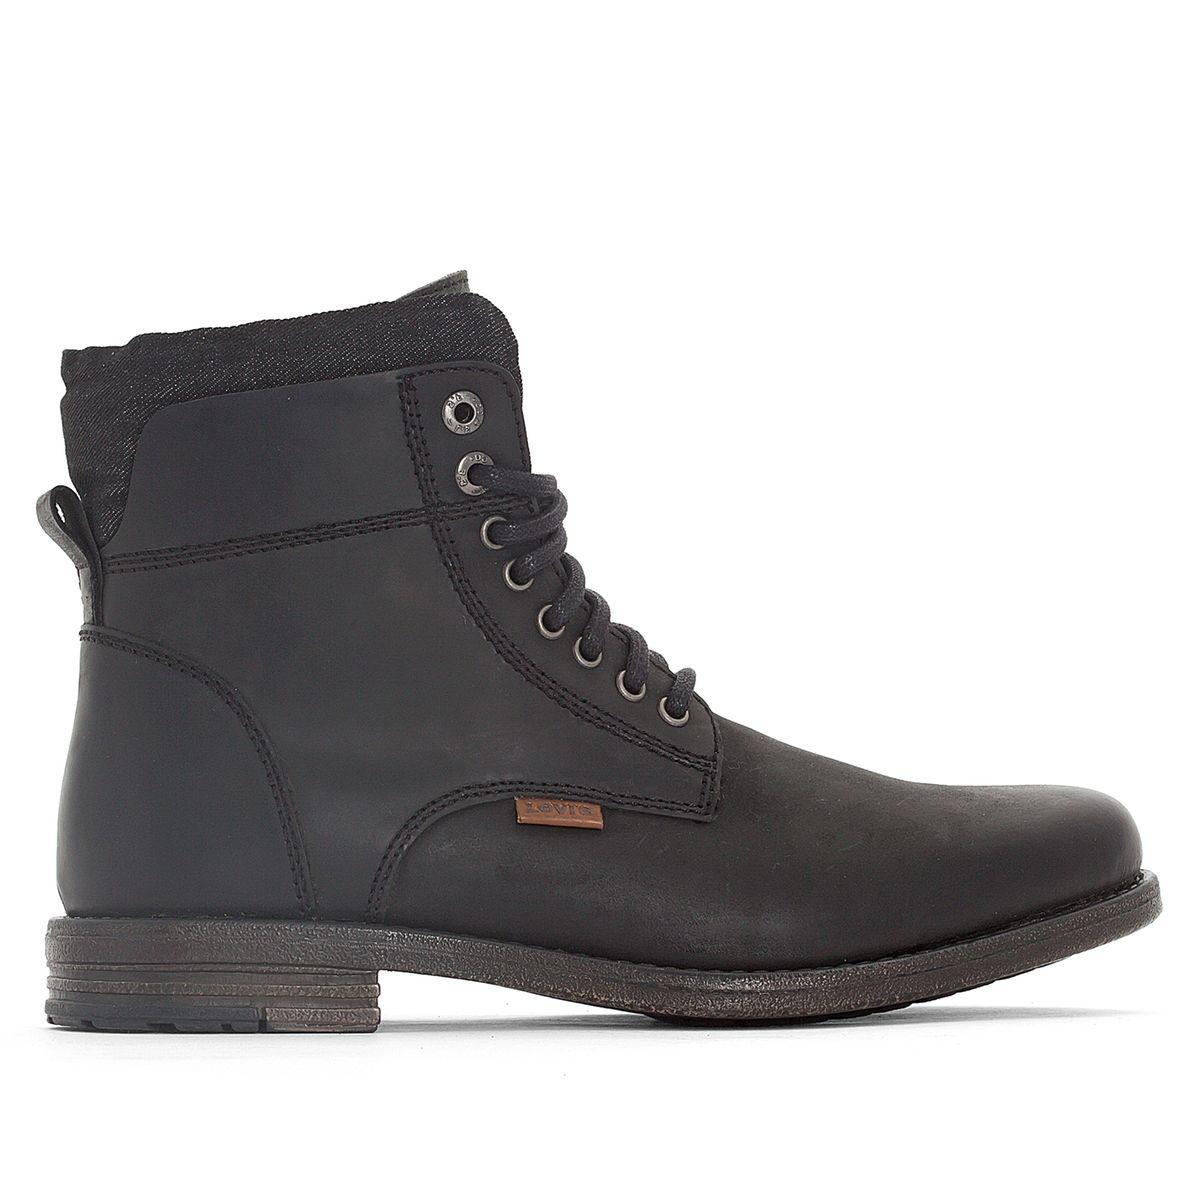 Boots cuir Emerson Collar